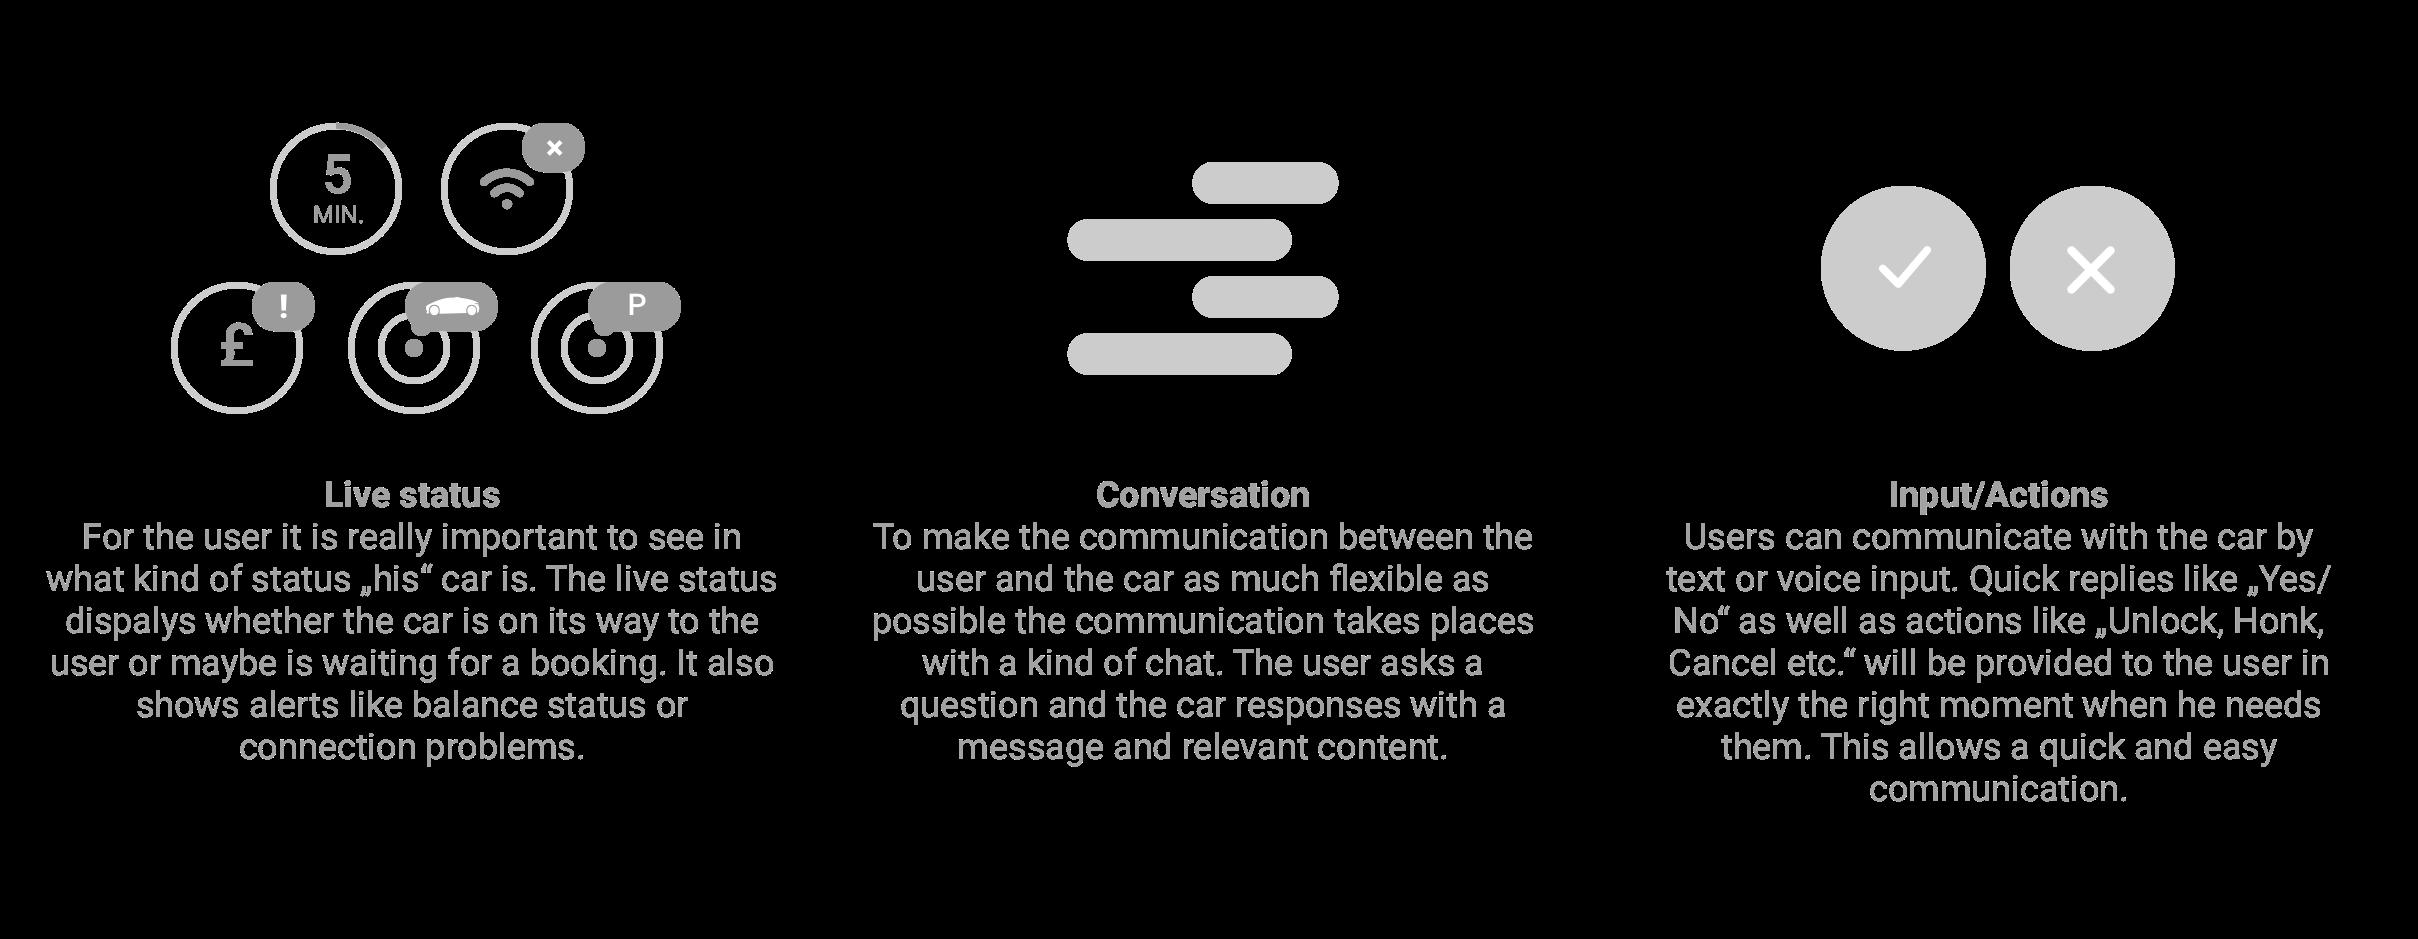 car_communication_actions